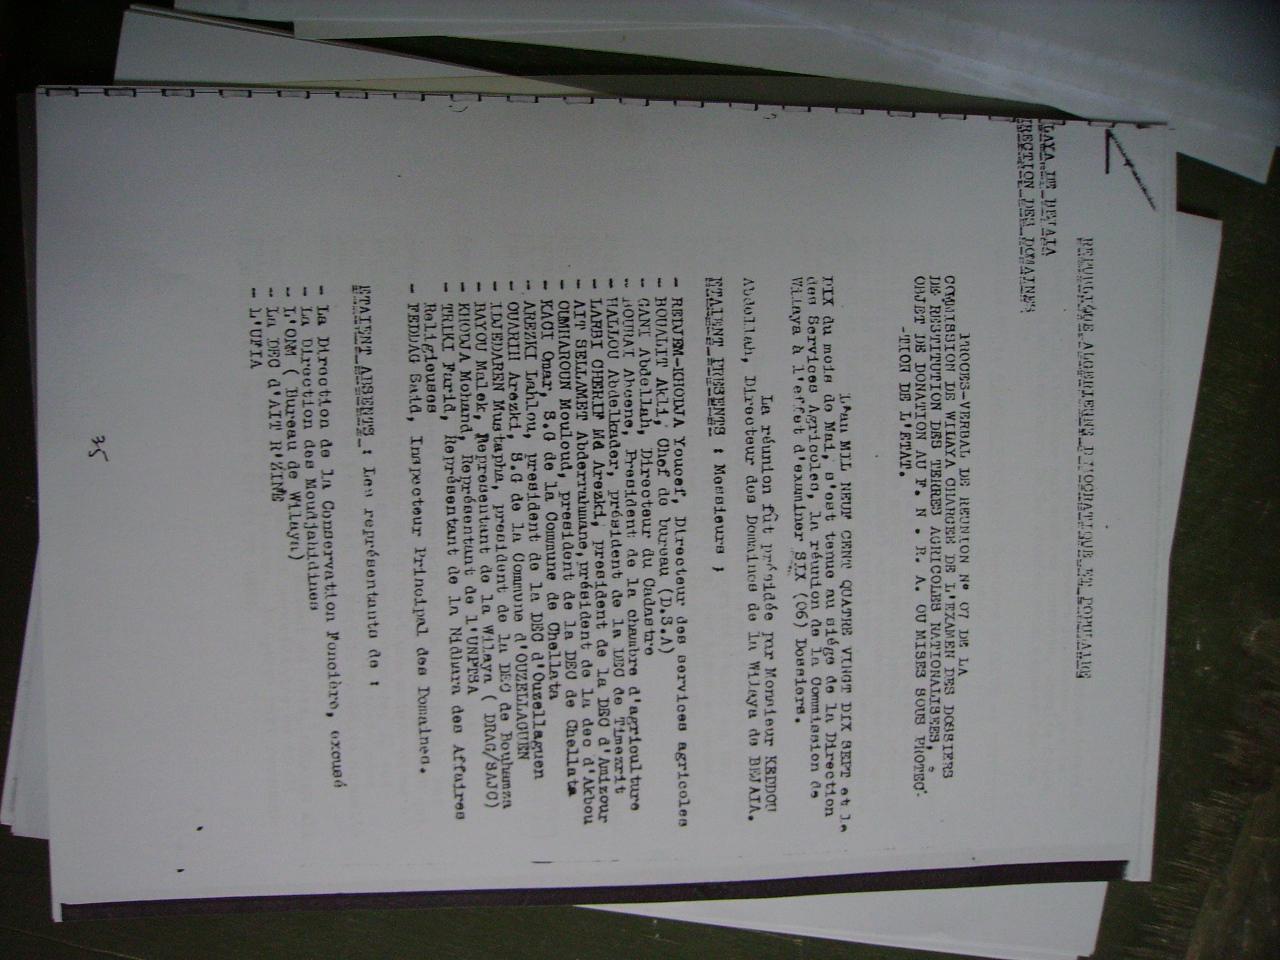 pvrunioncommissionrestitution10mai1997p2.jpg